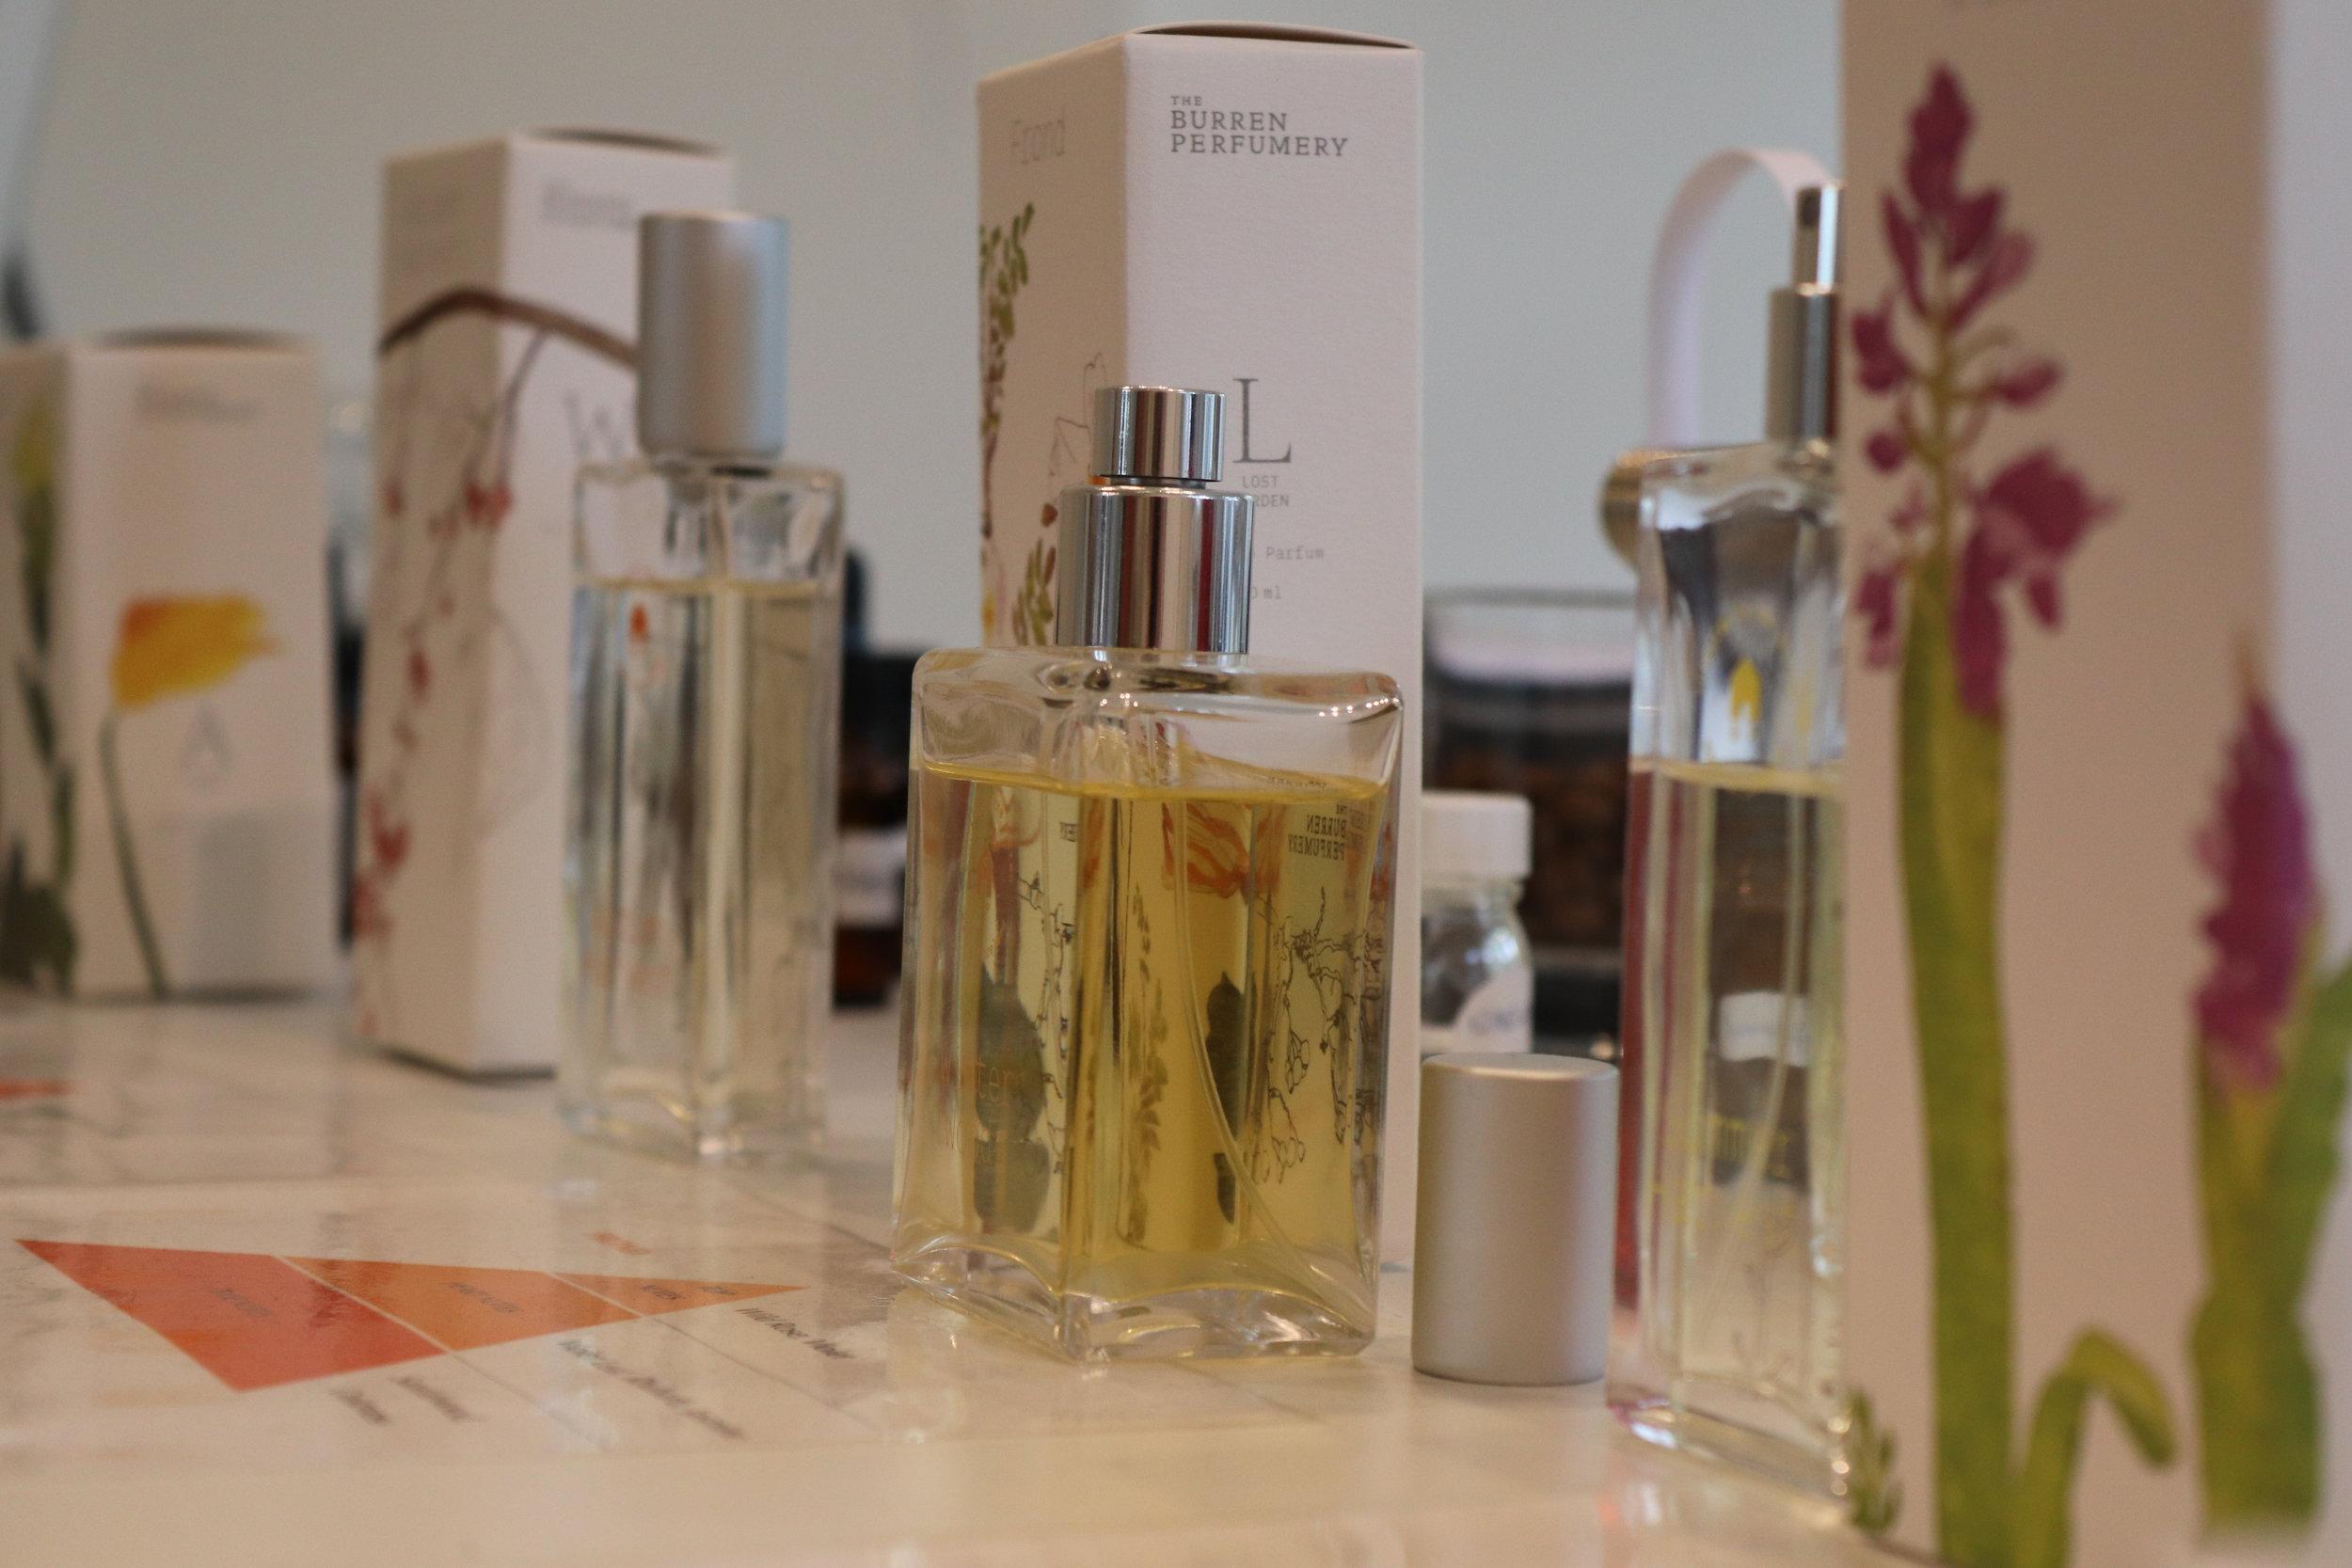 Beautiful perfumes - All made at the Burren Perfumery.